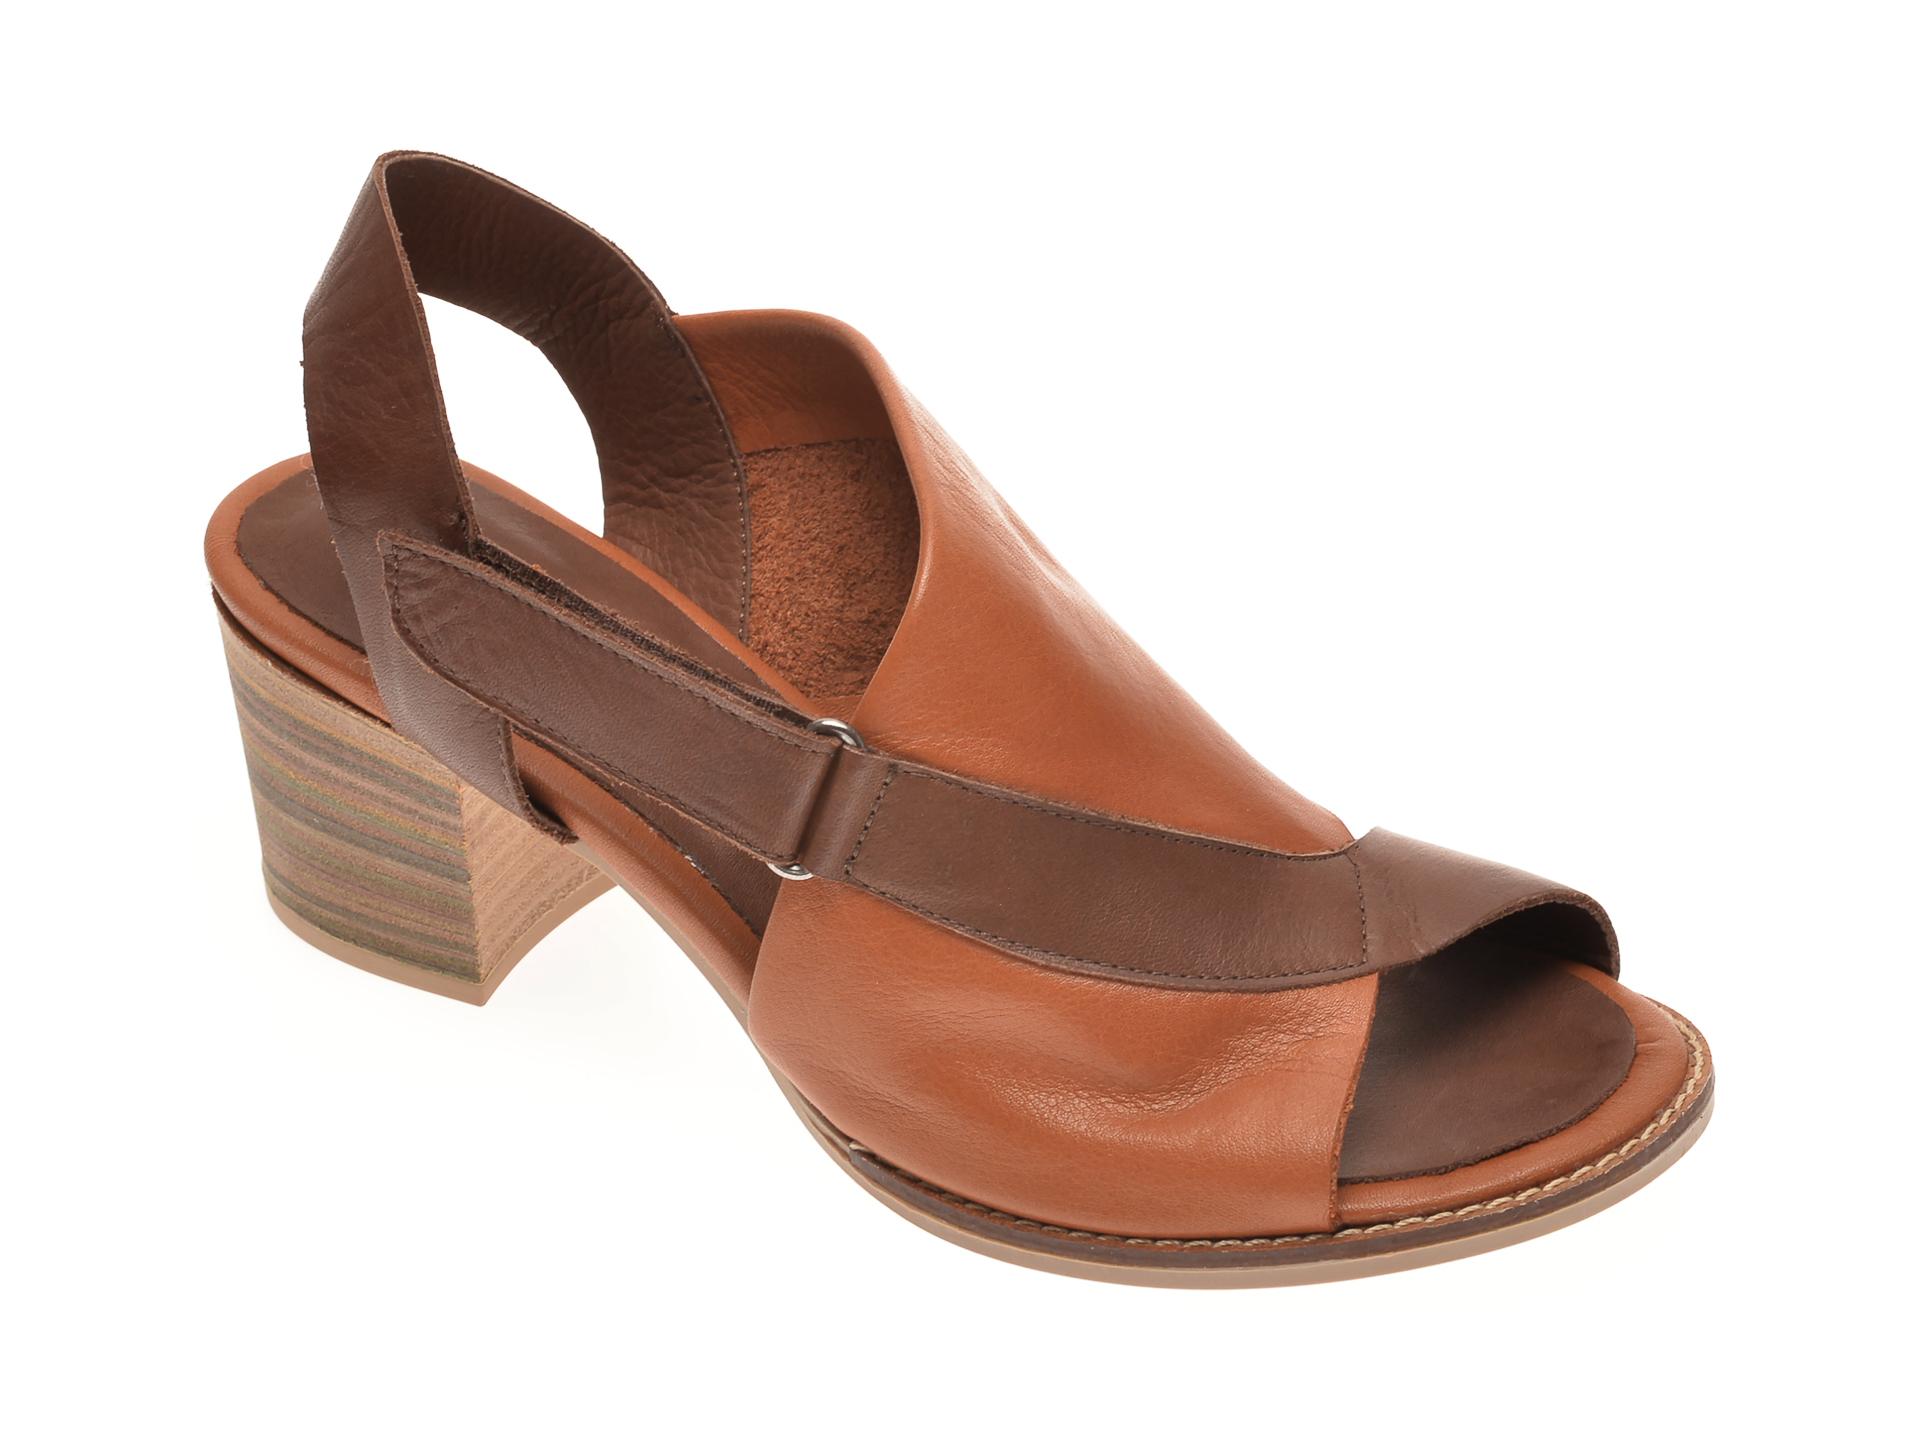 Sandale BABOOS maro, 1703, din piele naturala